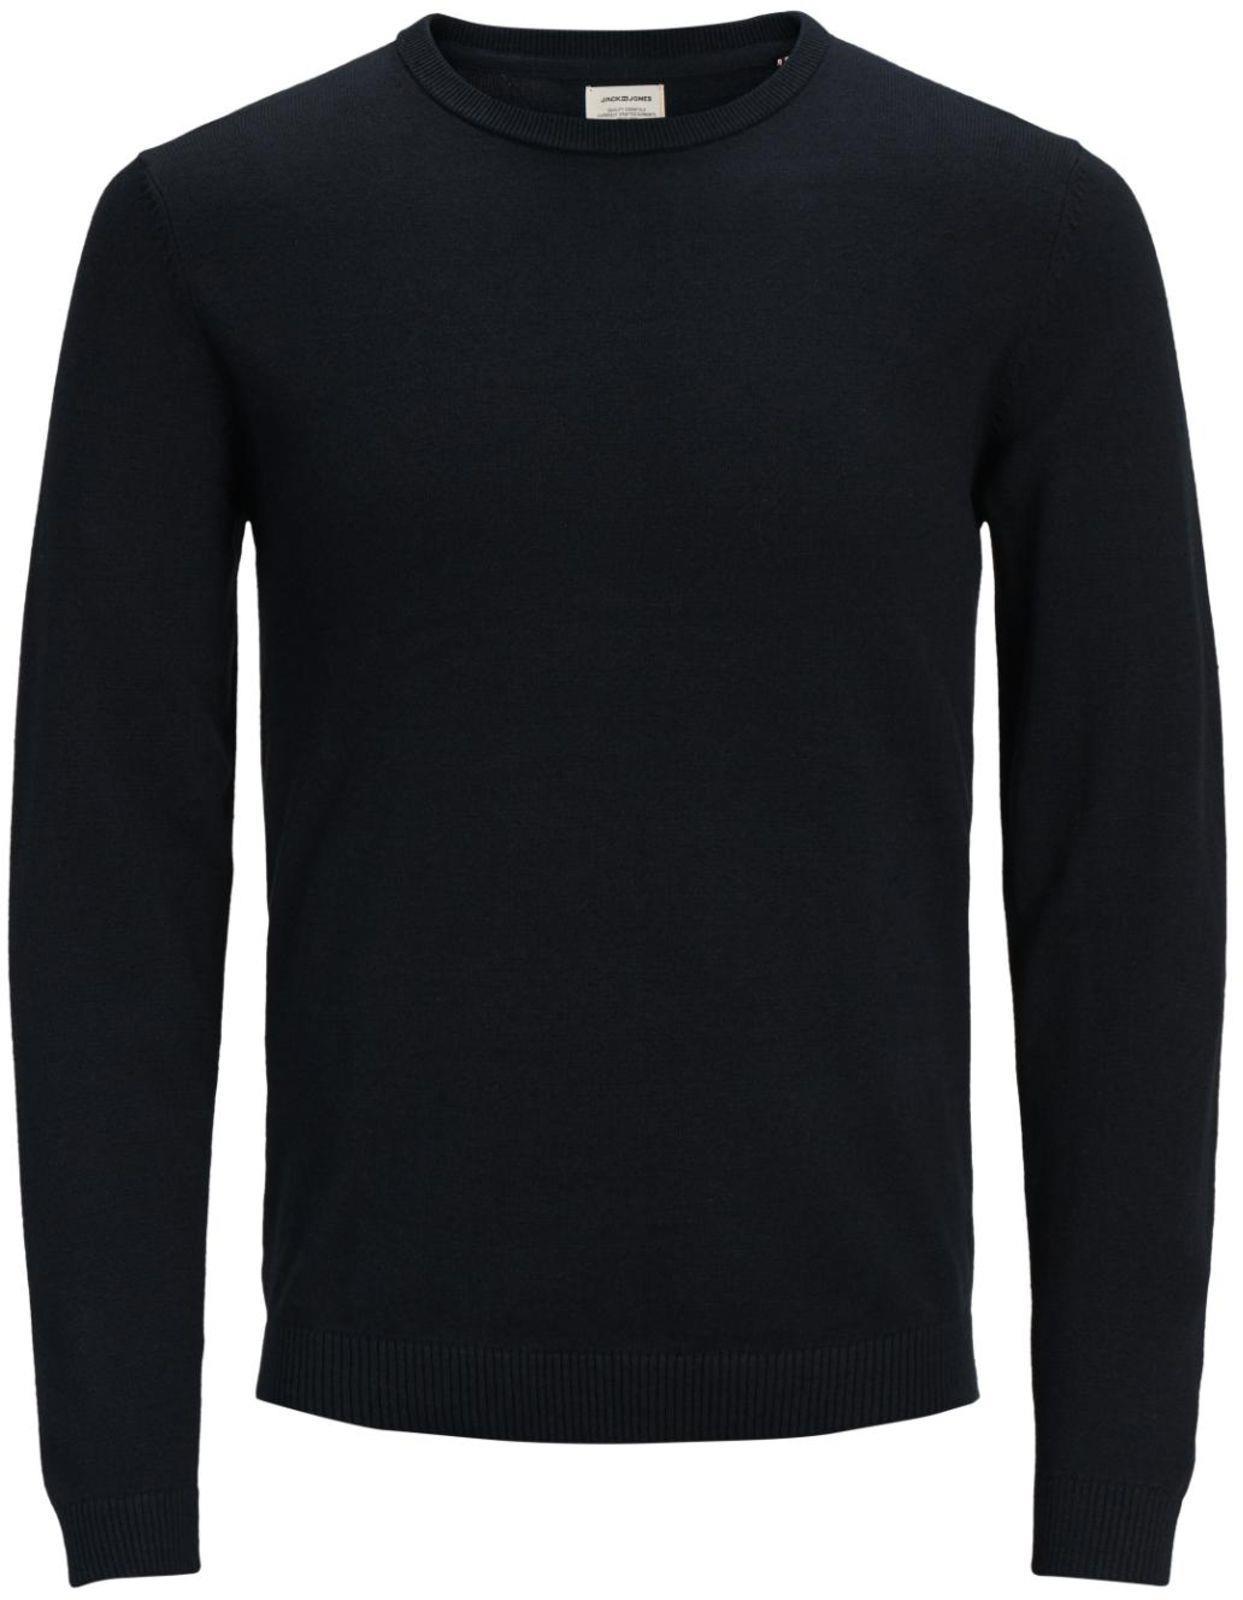 Jack-amp-Jones-Jumpers-Sweaters-Cardigans-Assorted-S-XXL miniatuur 21